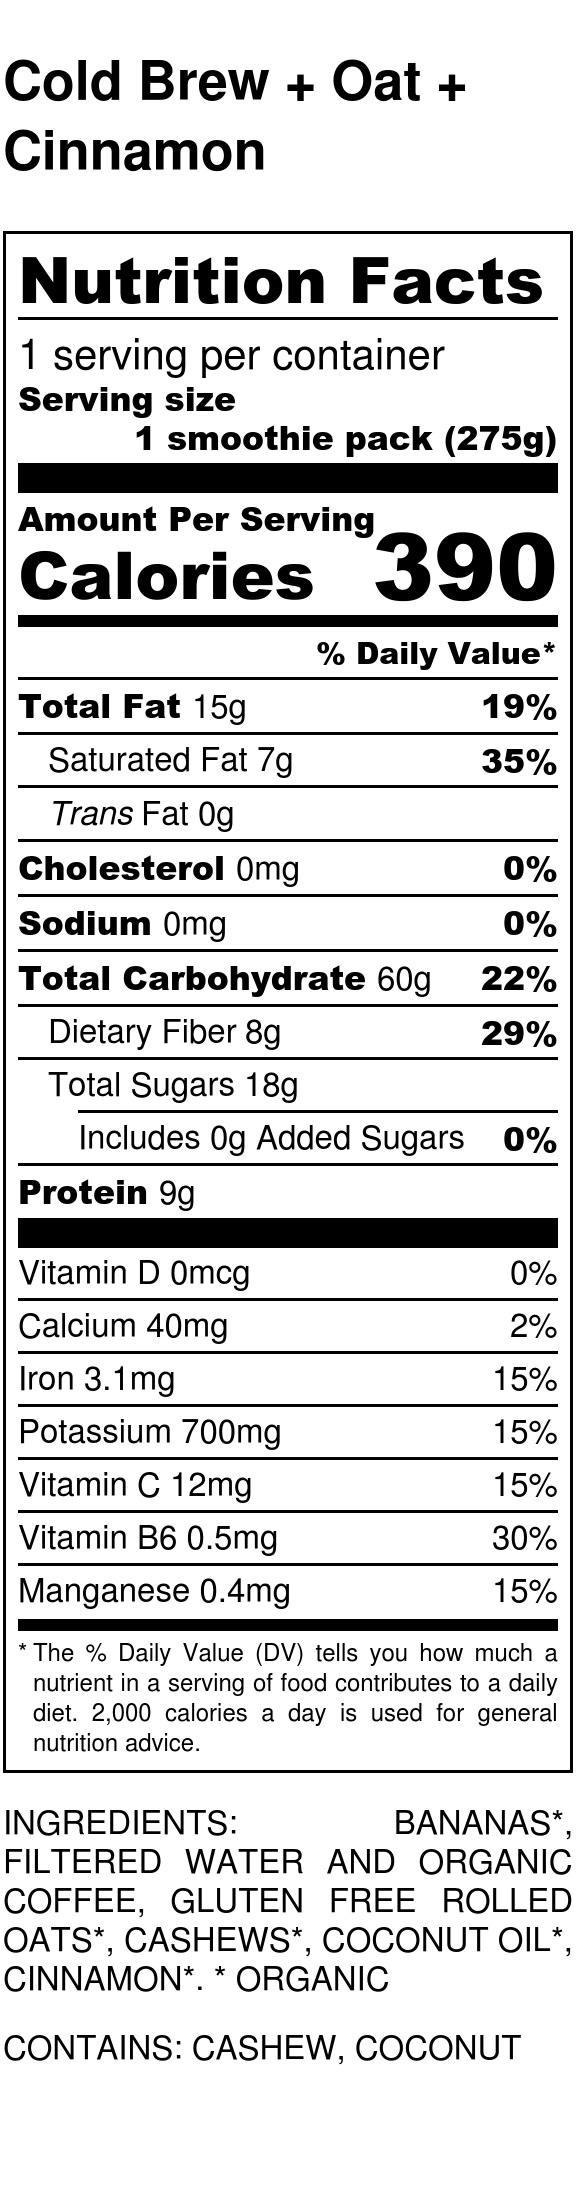 Cold Brew + Oat + Cinnamon - Nutrition Label.jpg